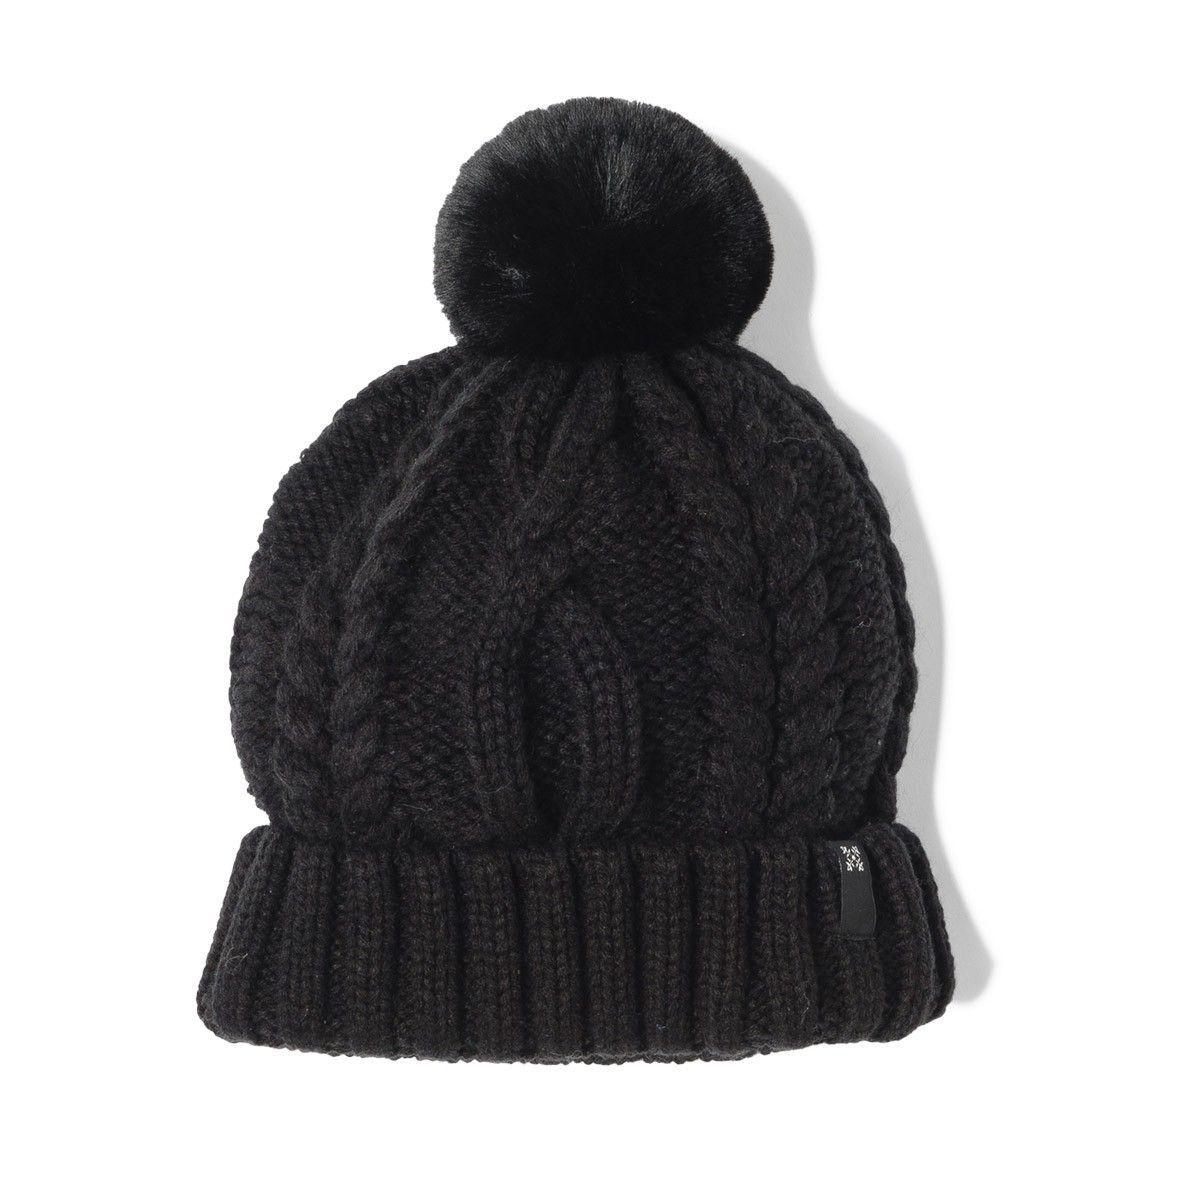 3bcecae65 Oxbow Indri Beanie - Black | Beanies | Beanie, Knitted hats, Beanie hats